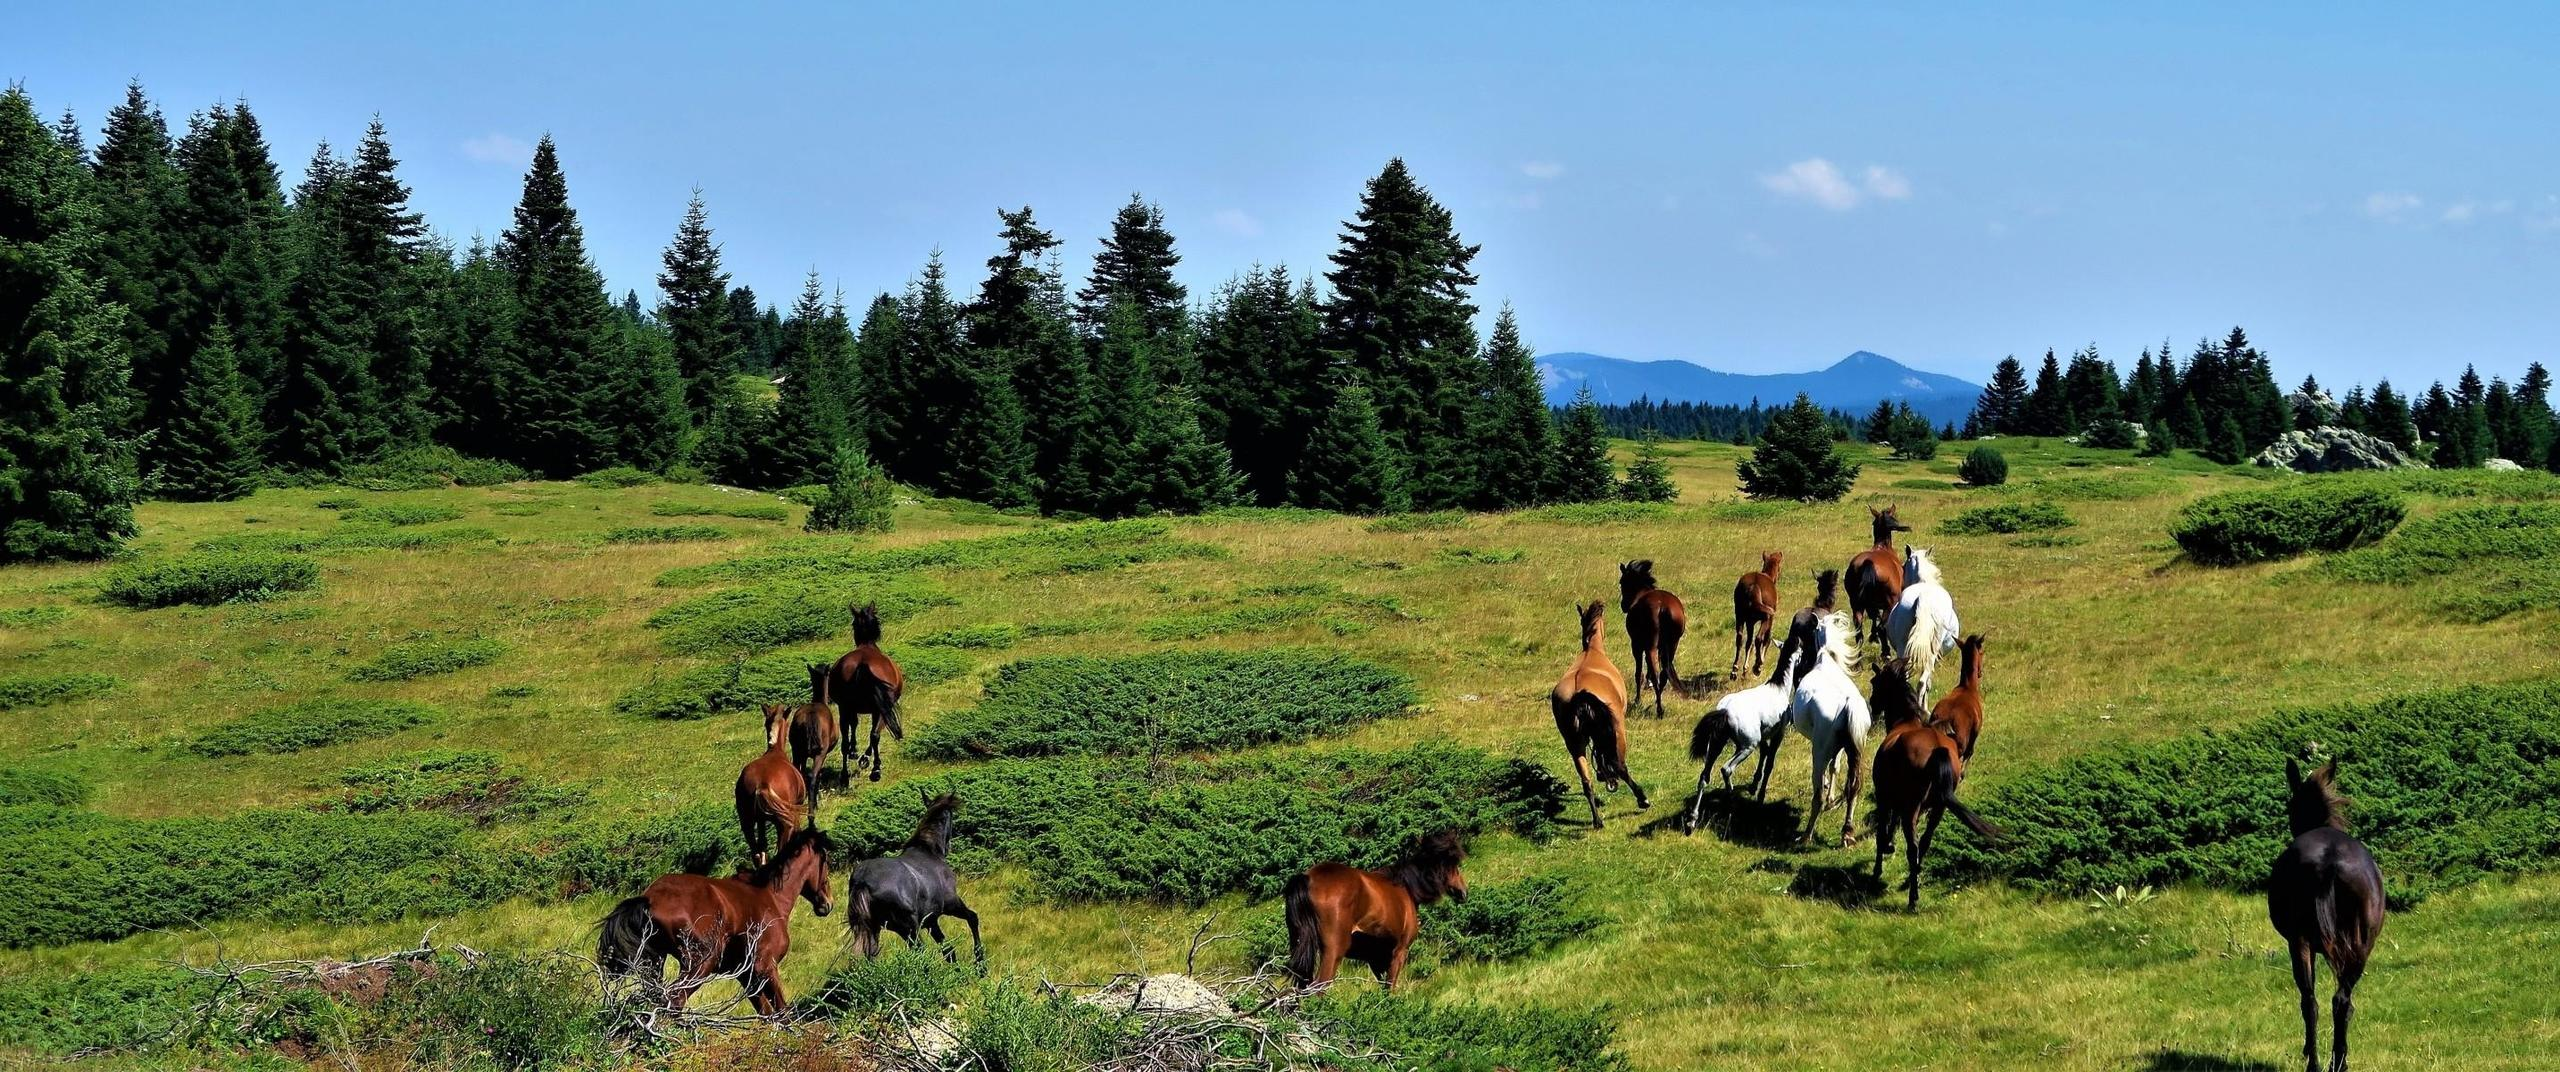 Frolicking horses